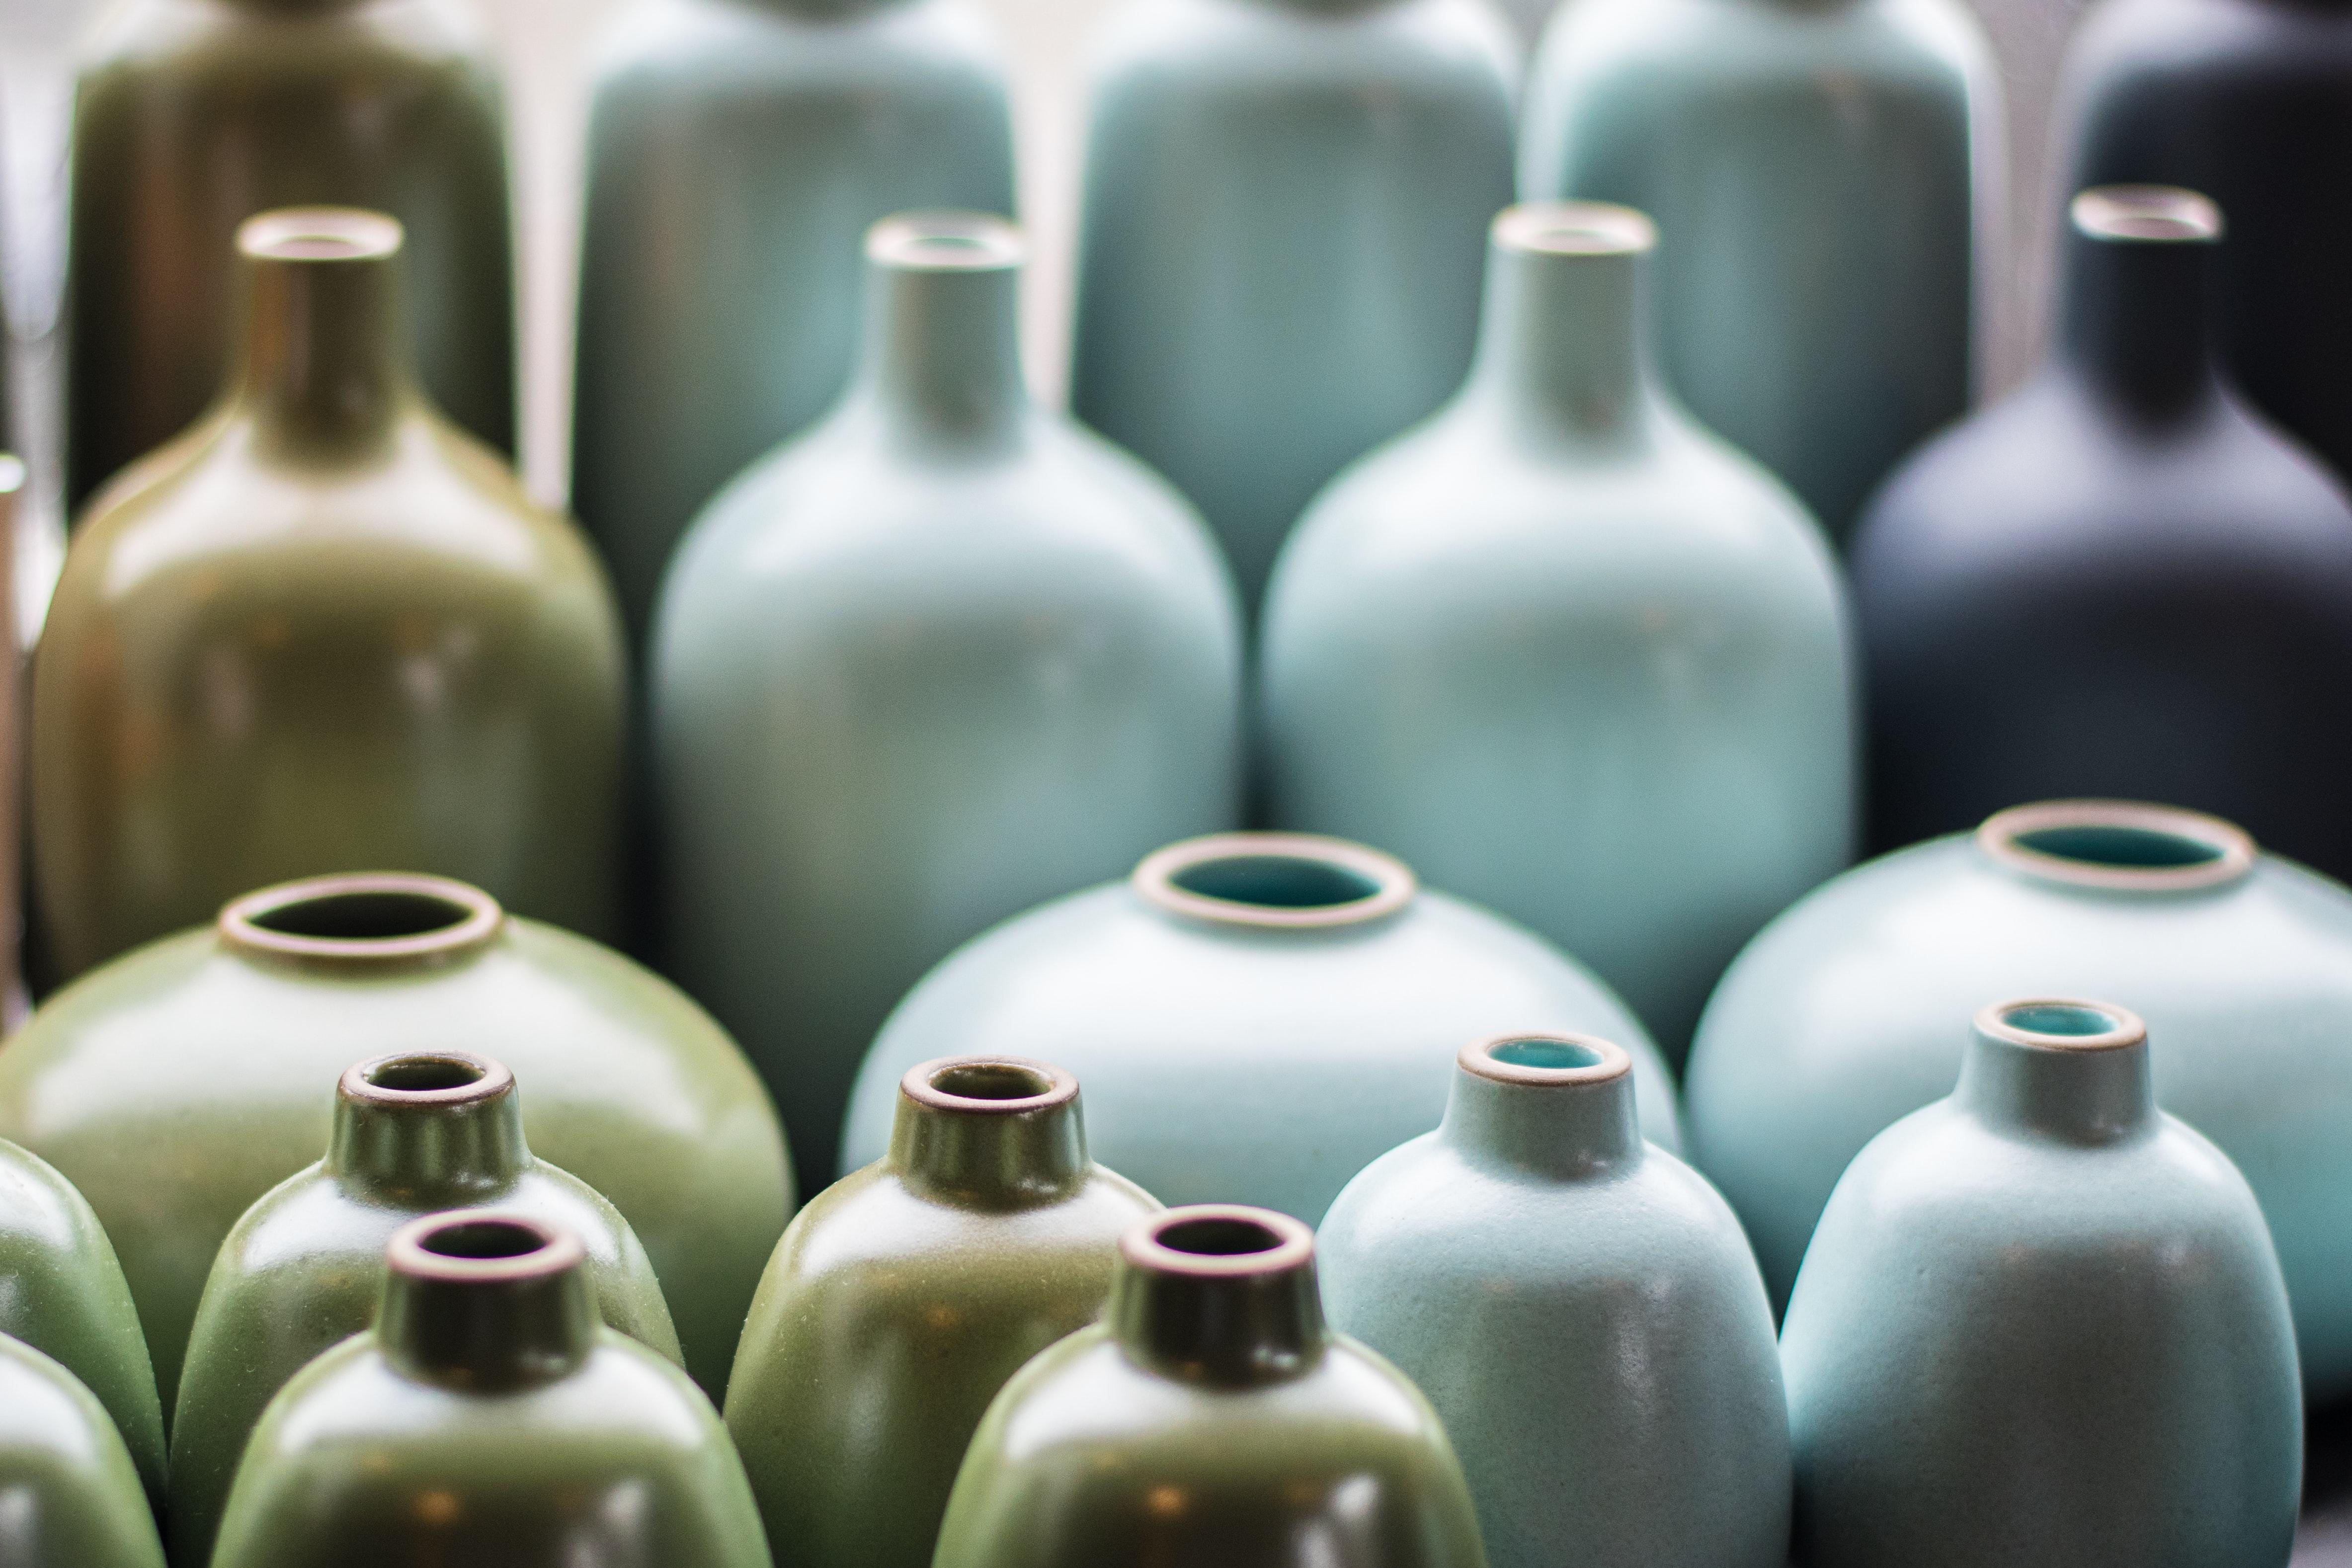 koopr-jessica-ruscello-unsplash-ceramic-poterie